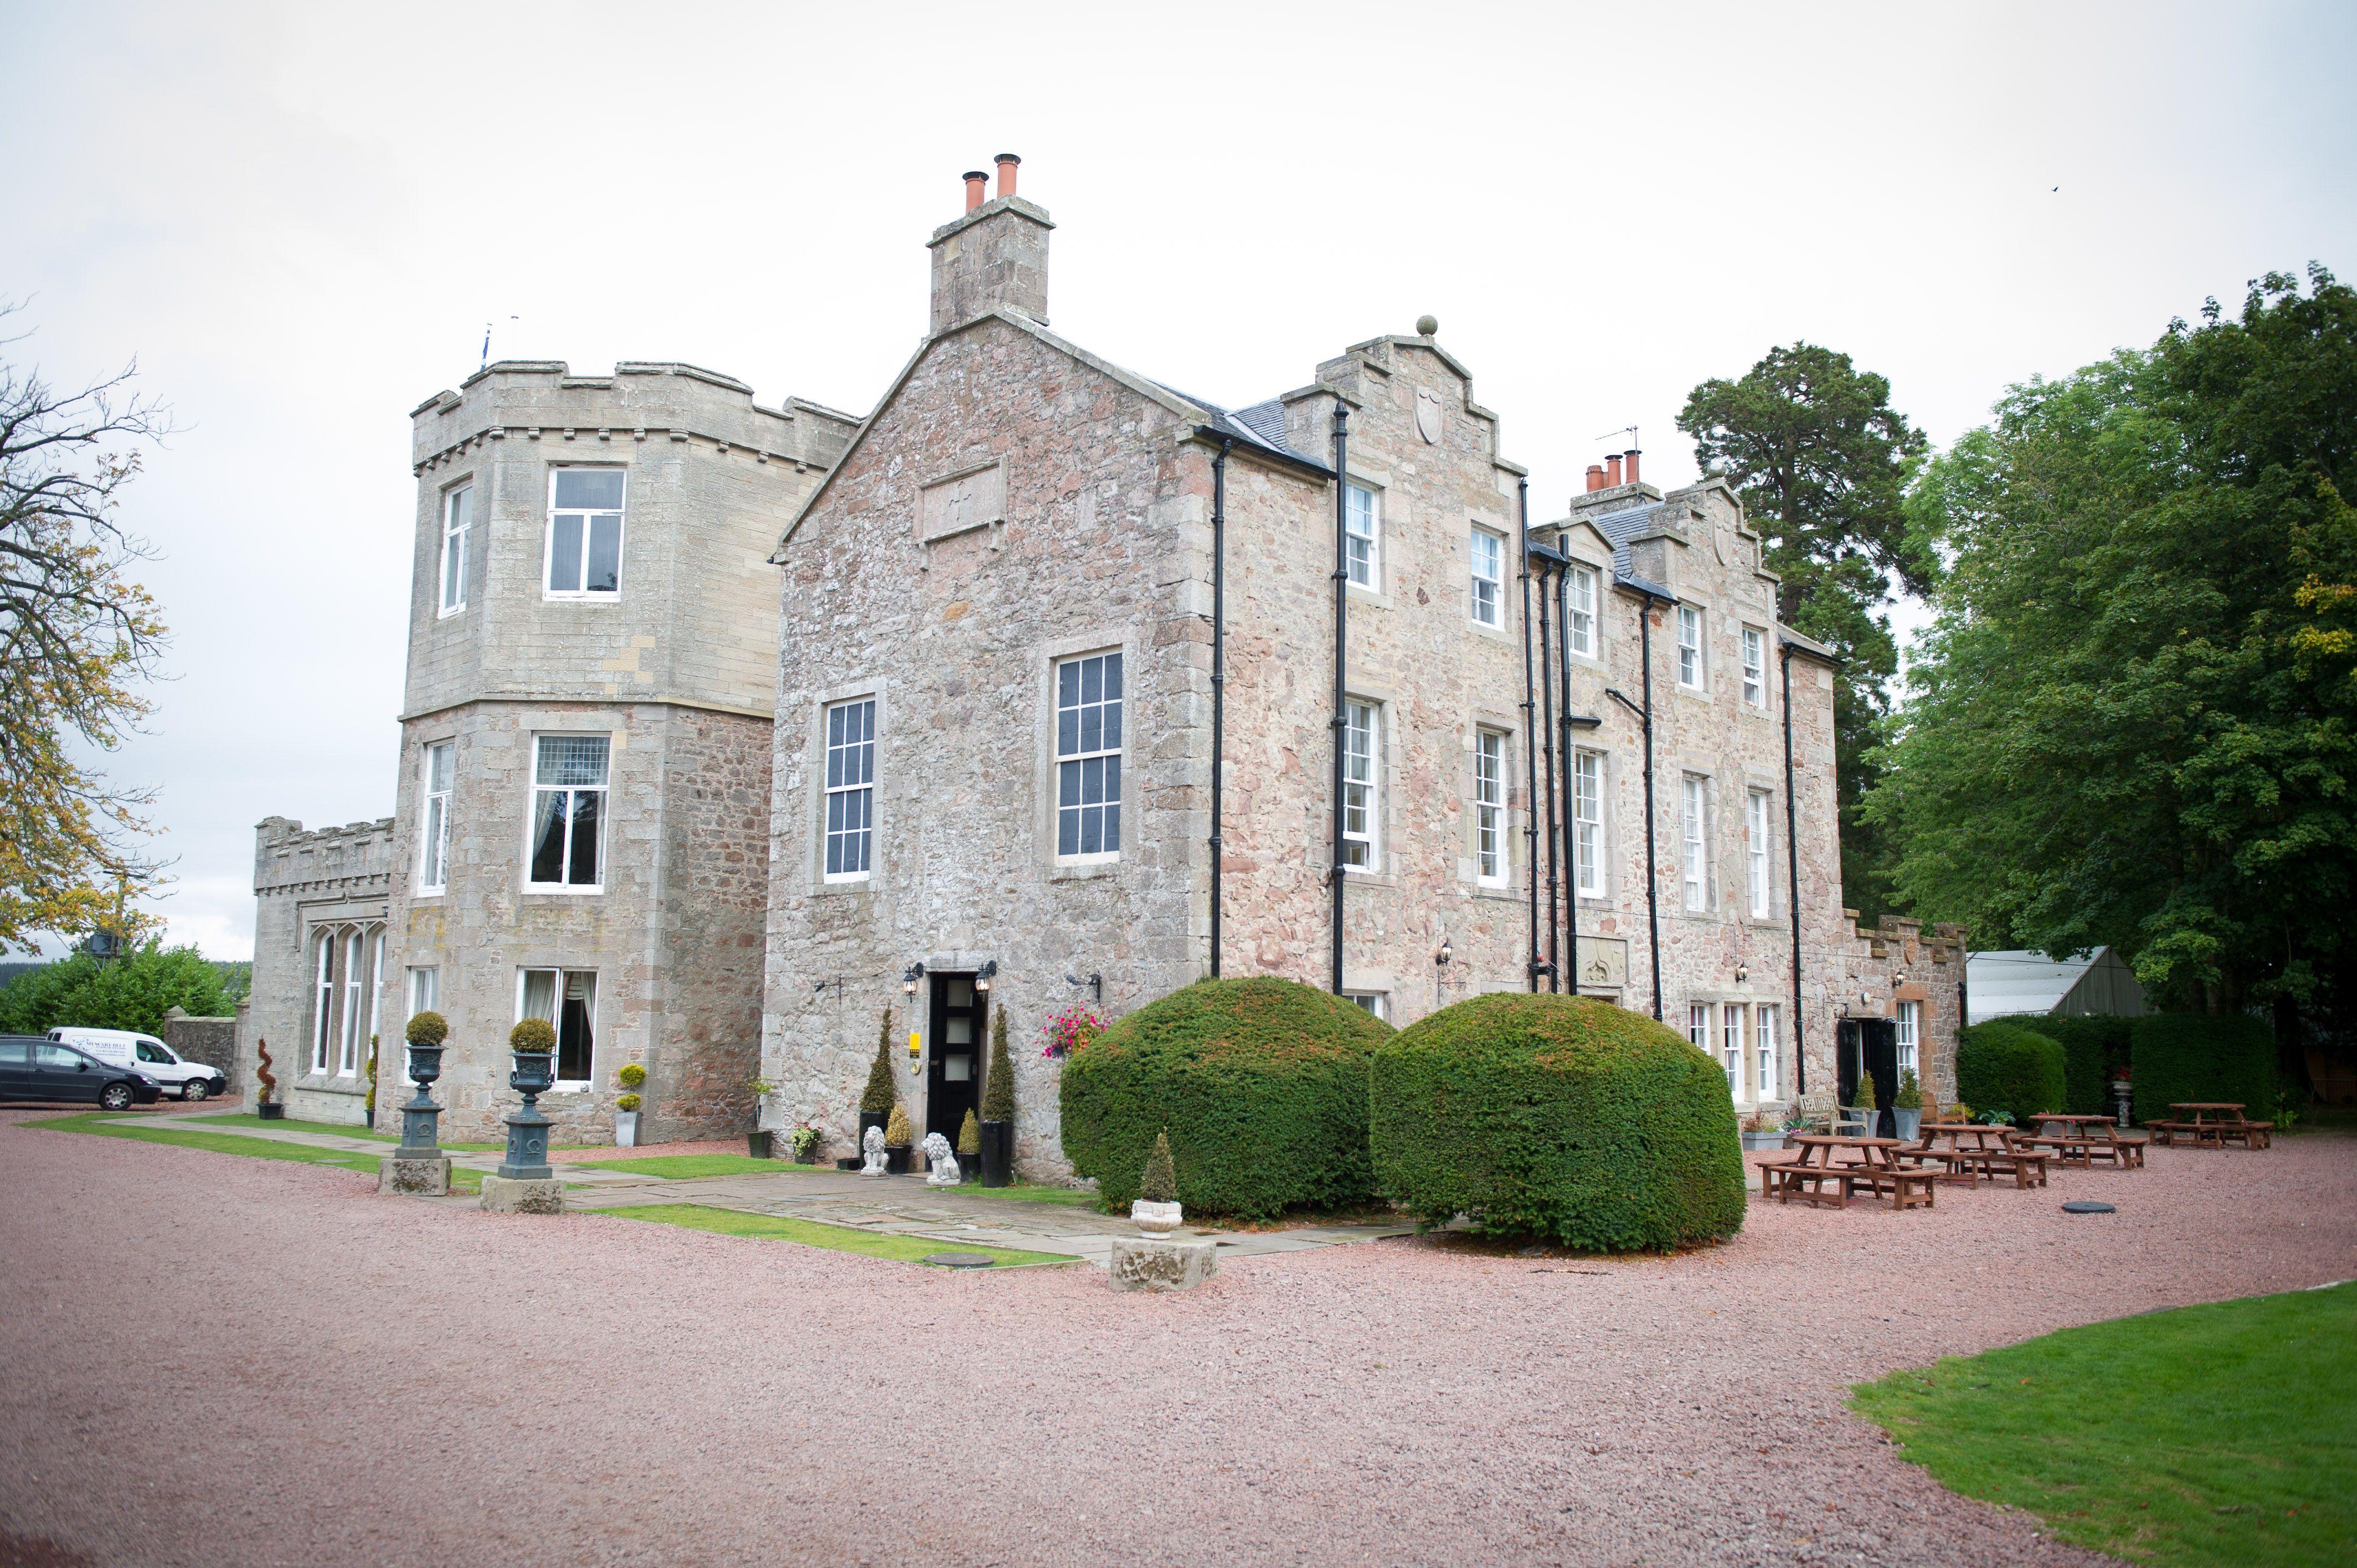 Our Fairytale Castle #castle #wedding #disney #scotland